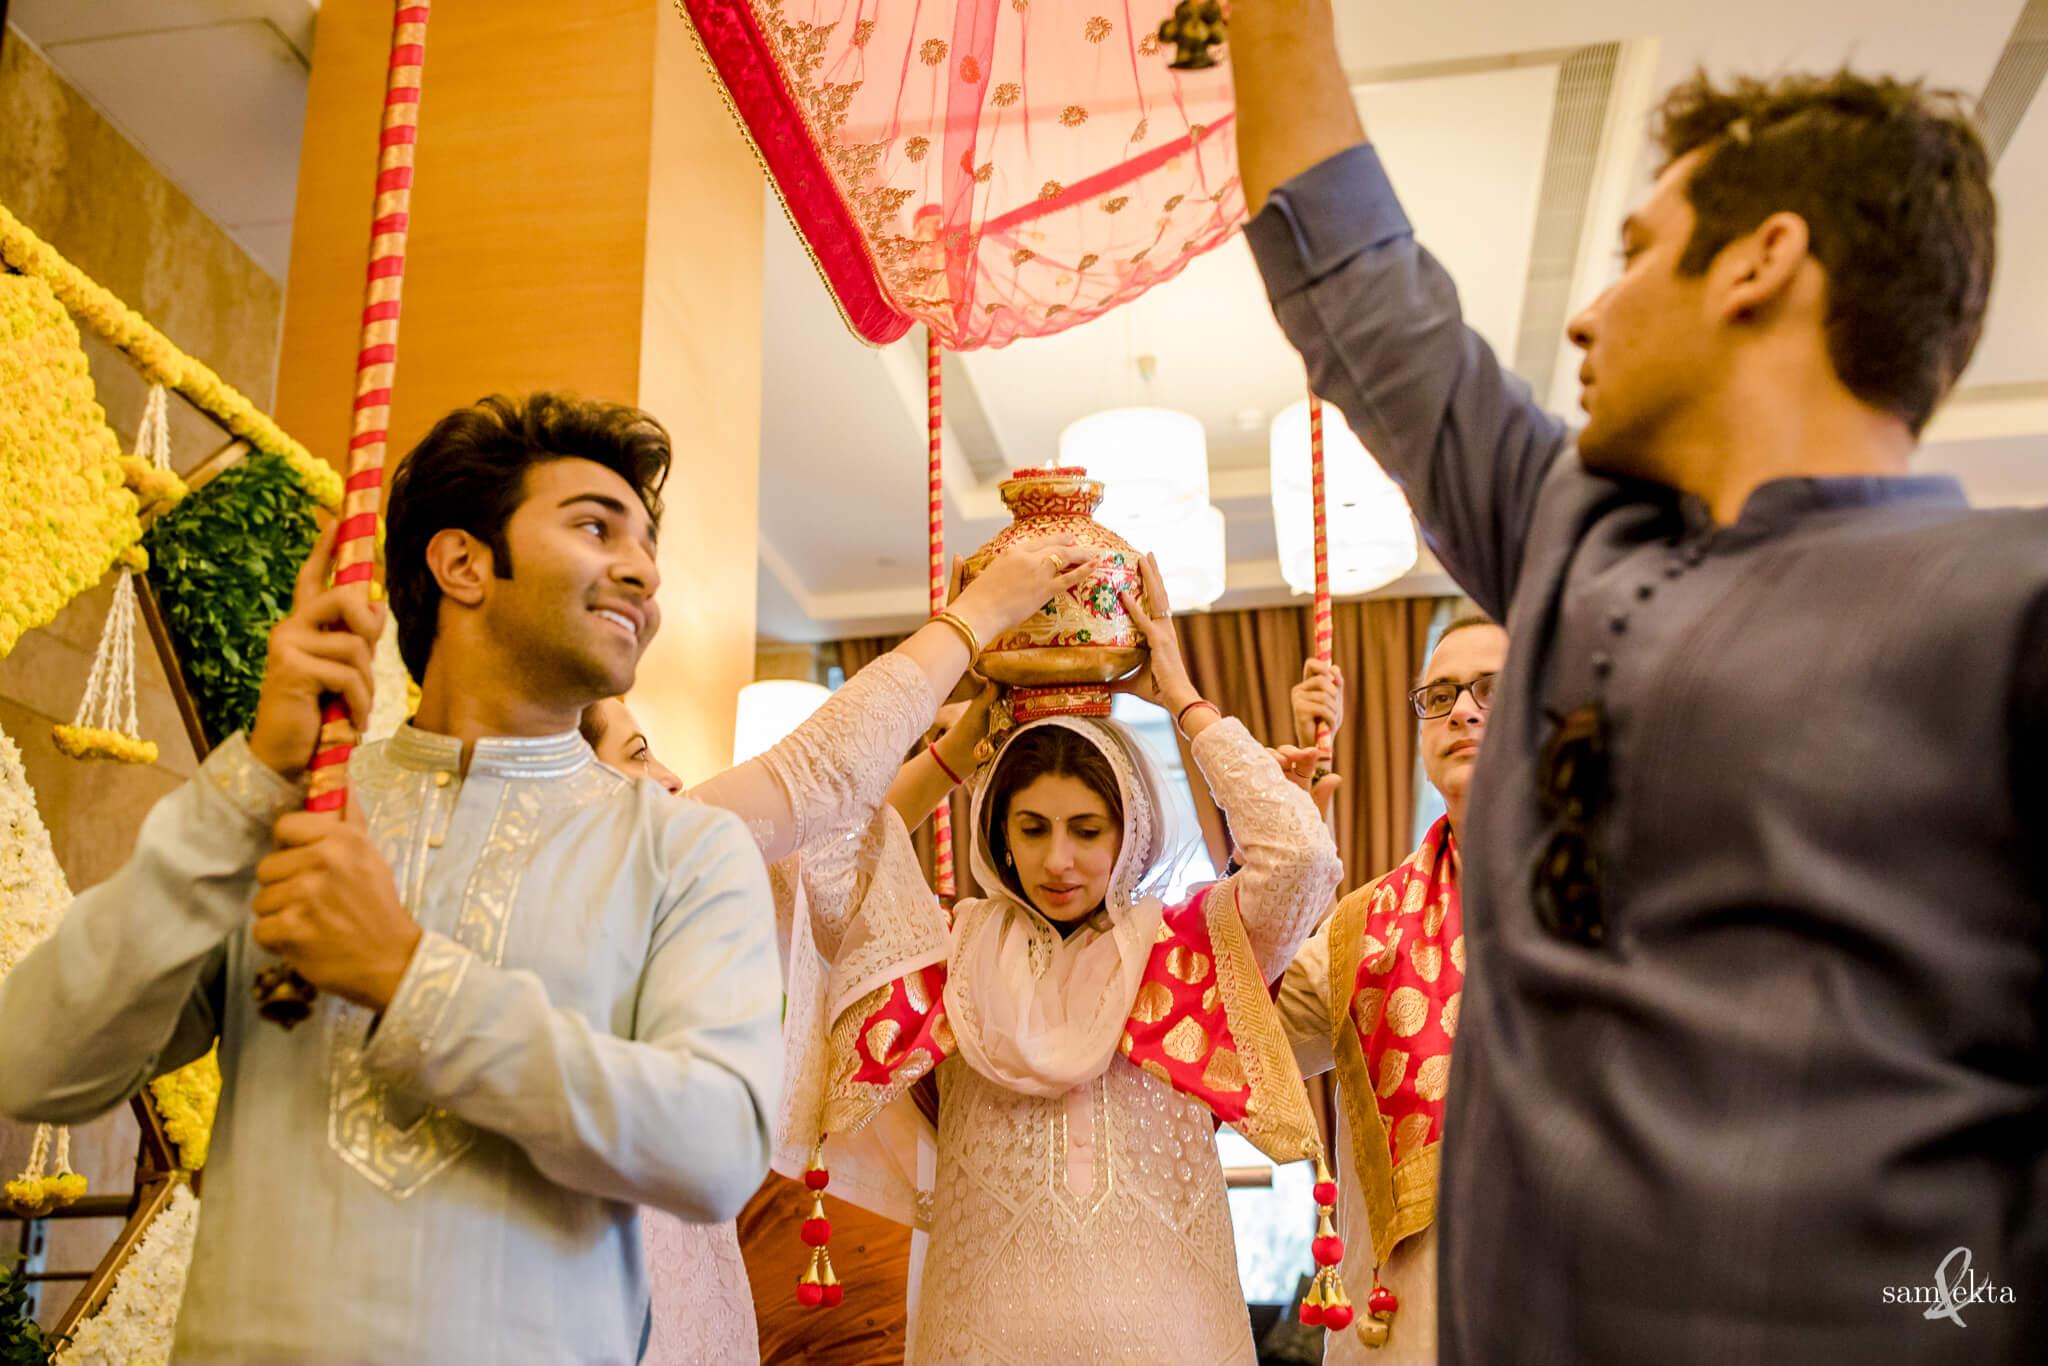 Armaan Jain and Anissa Malhotra's wedding pictures